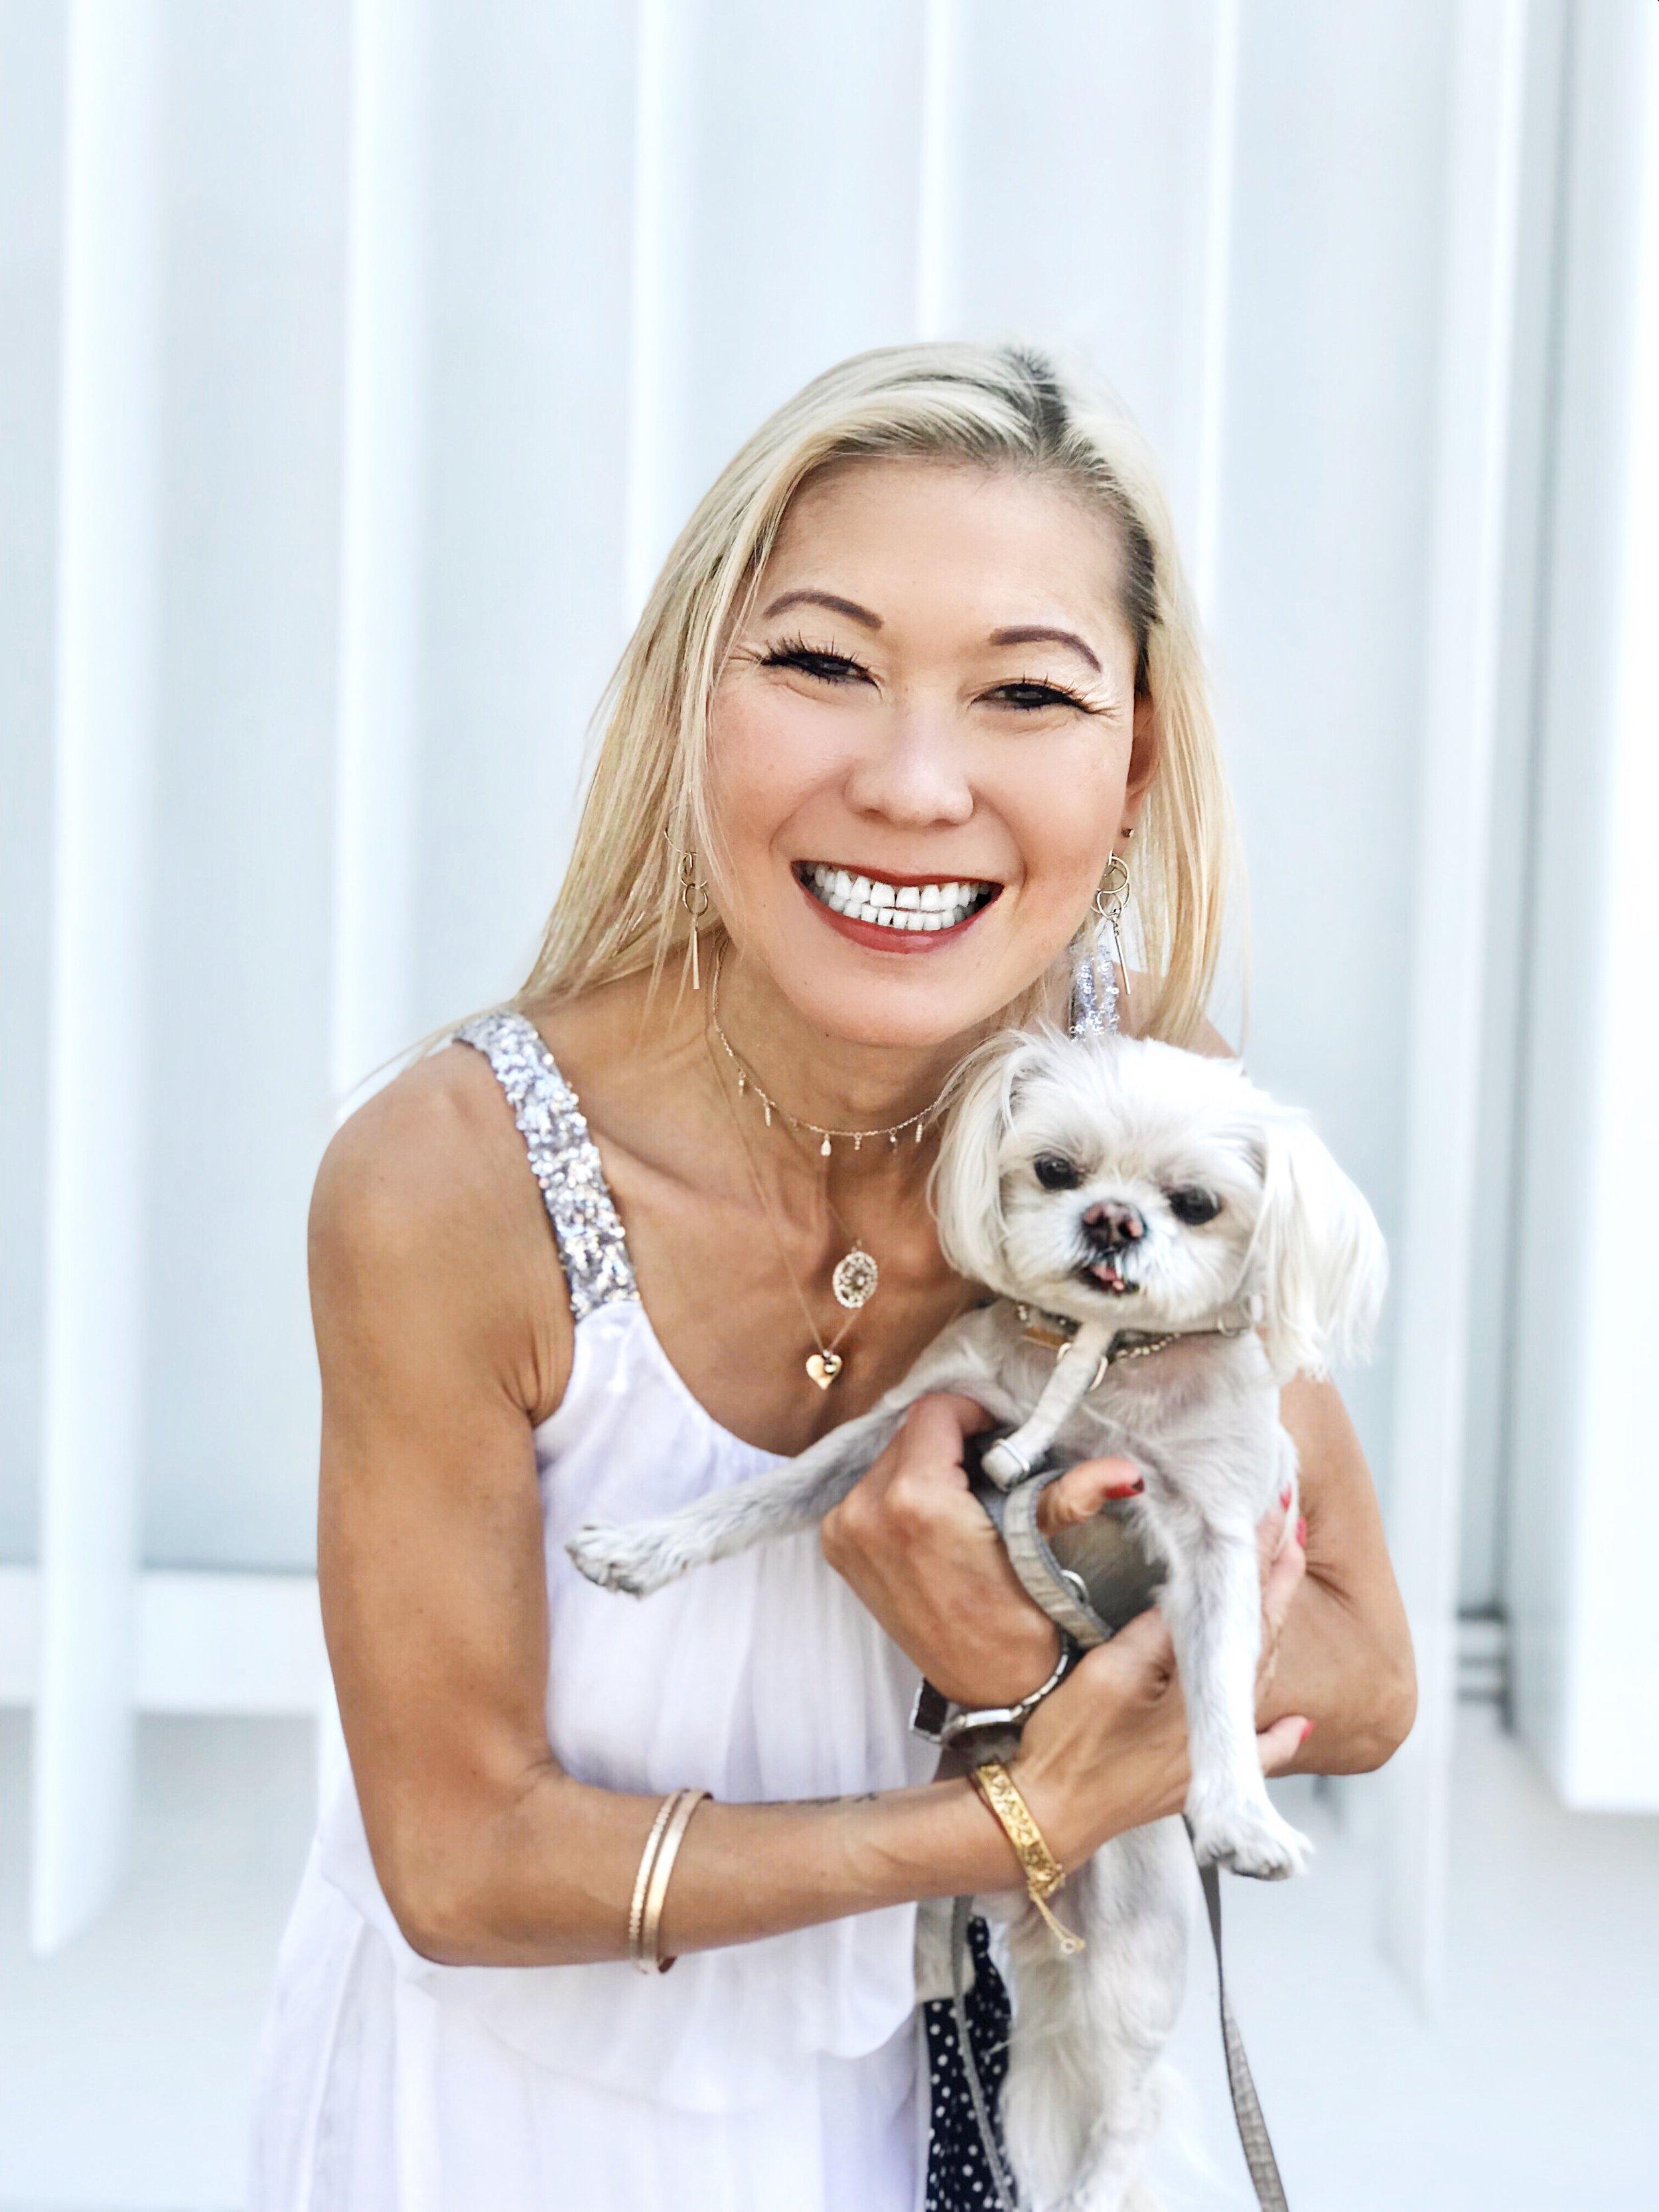 Shana Lynn Yao, brand strategist